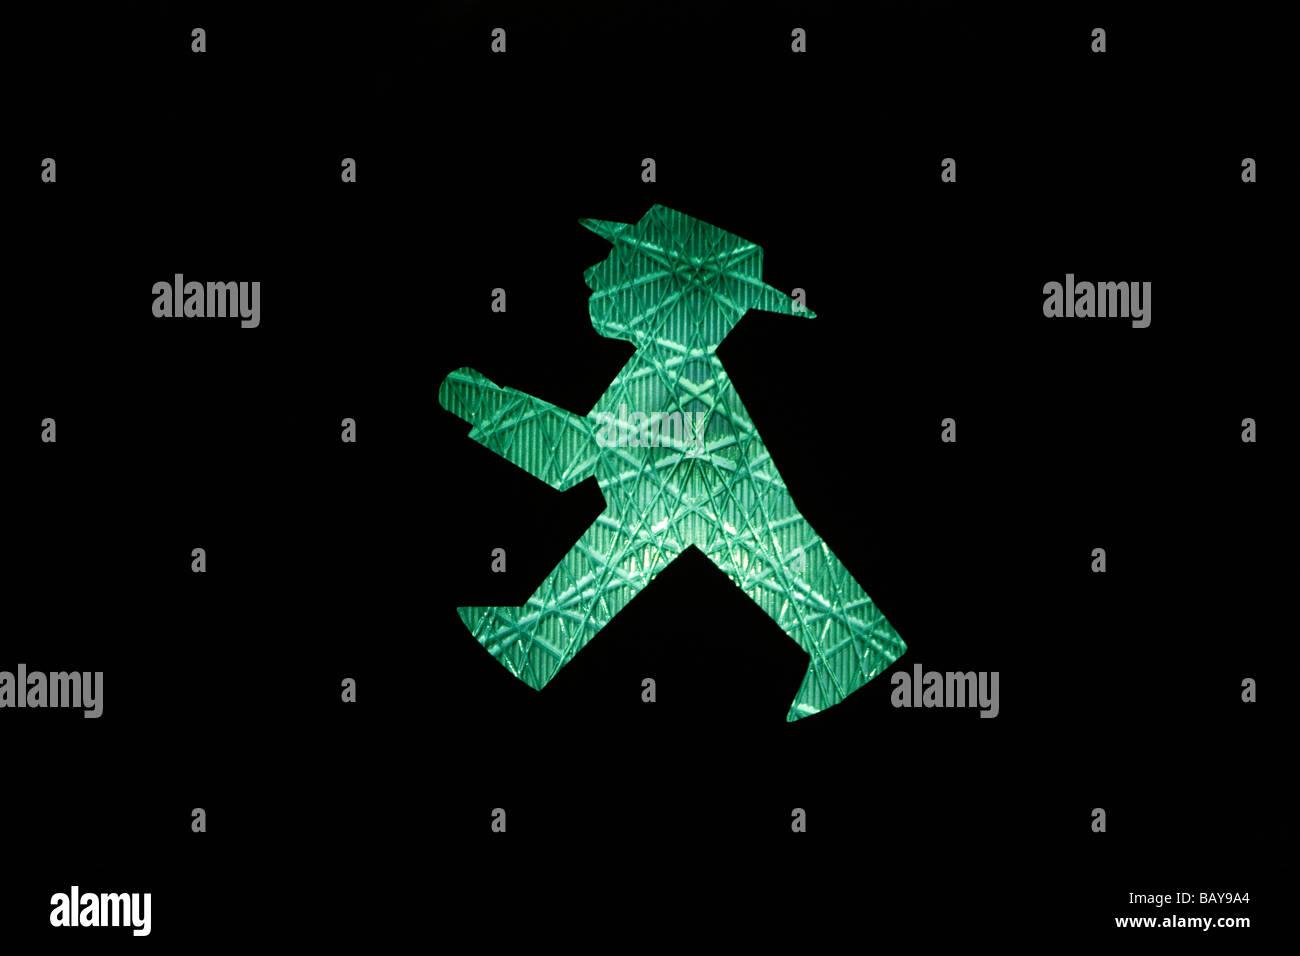 Traffic lights, green, walk, Germany - Stock Image